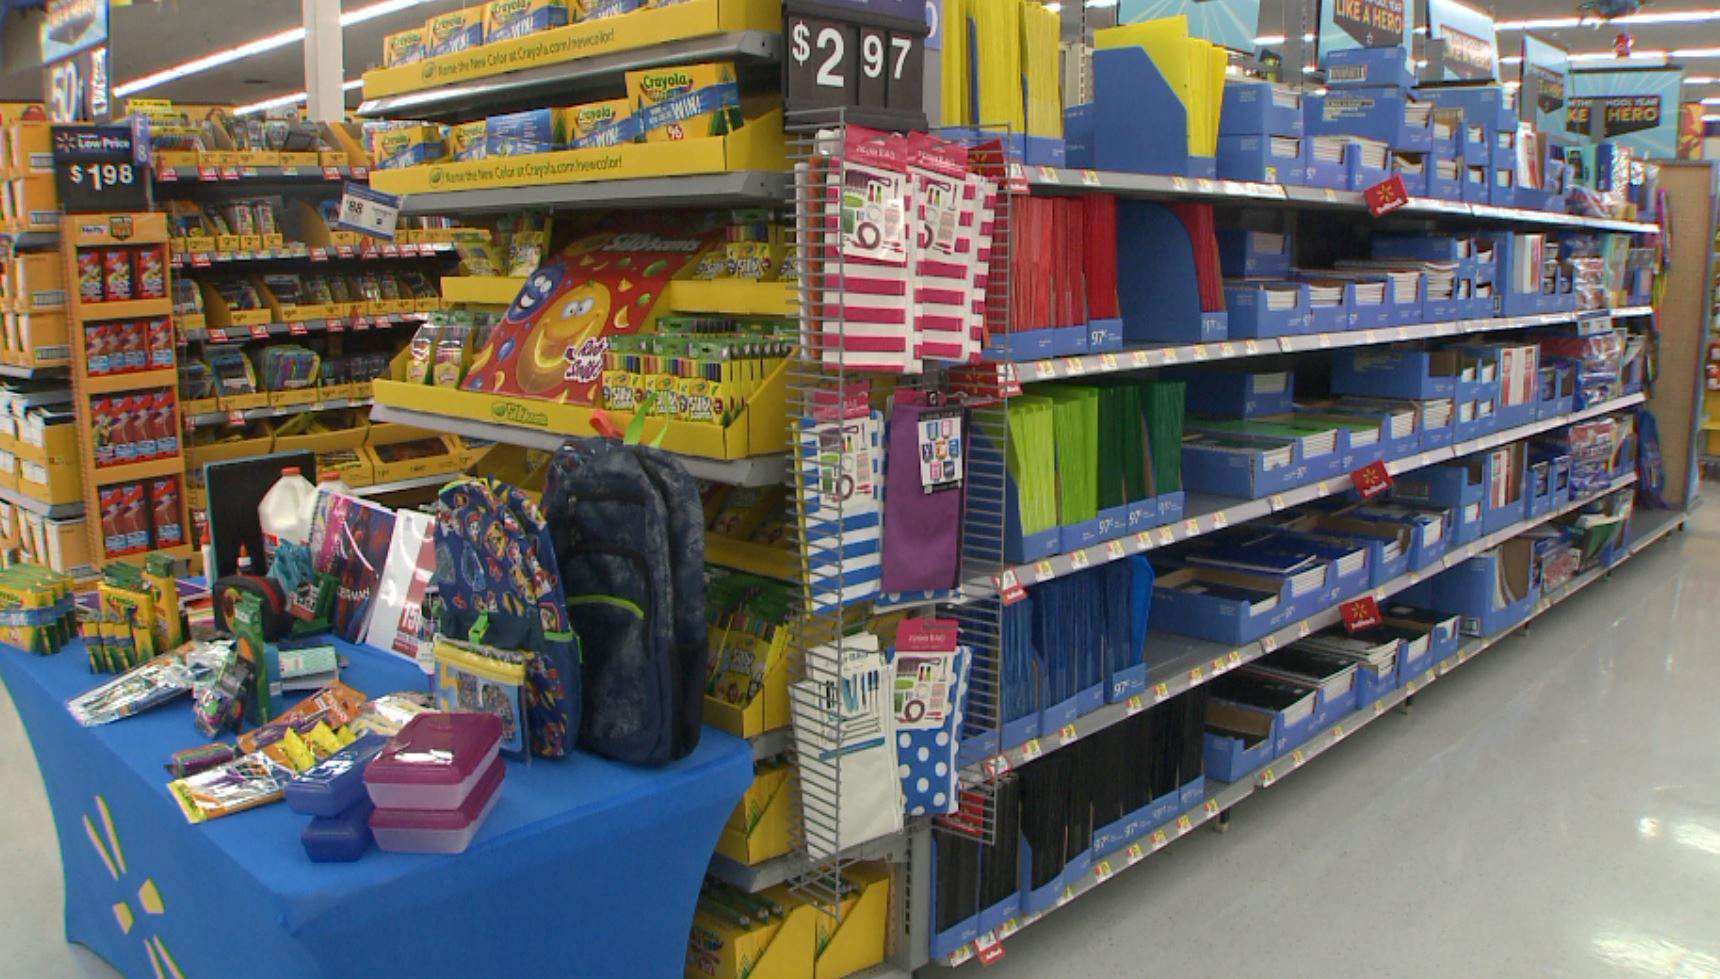 Walmart Back to School - supplies - shopping_523966